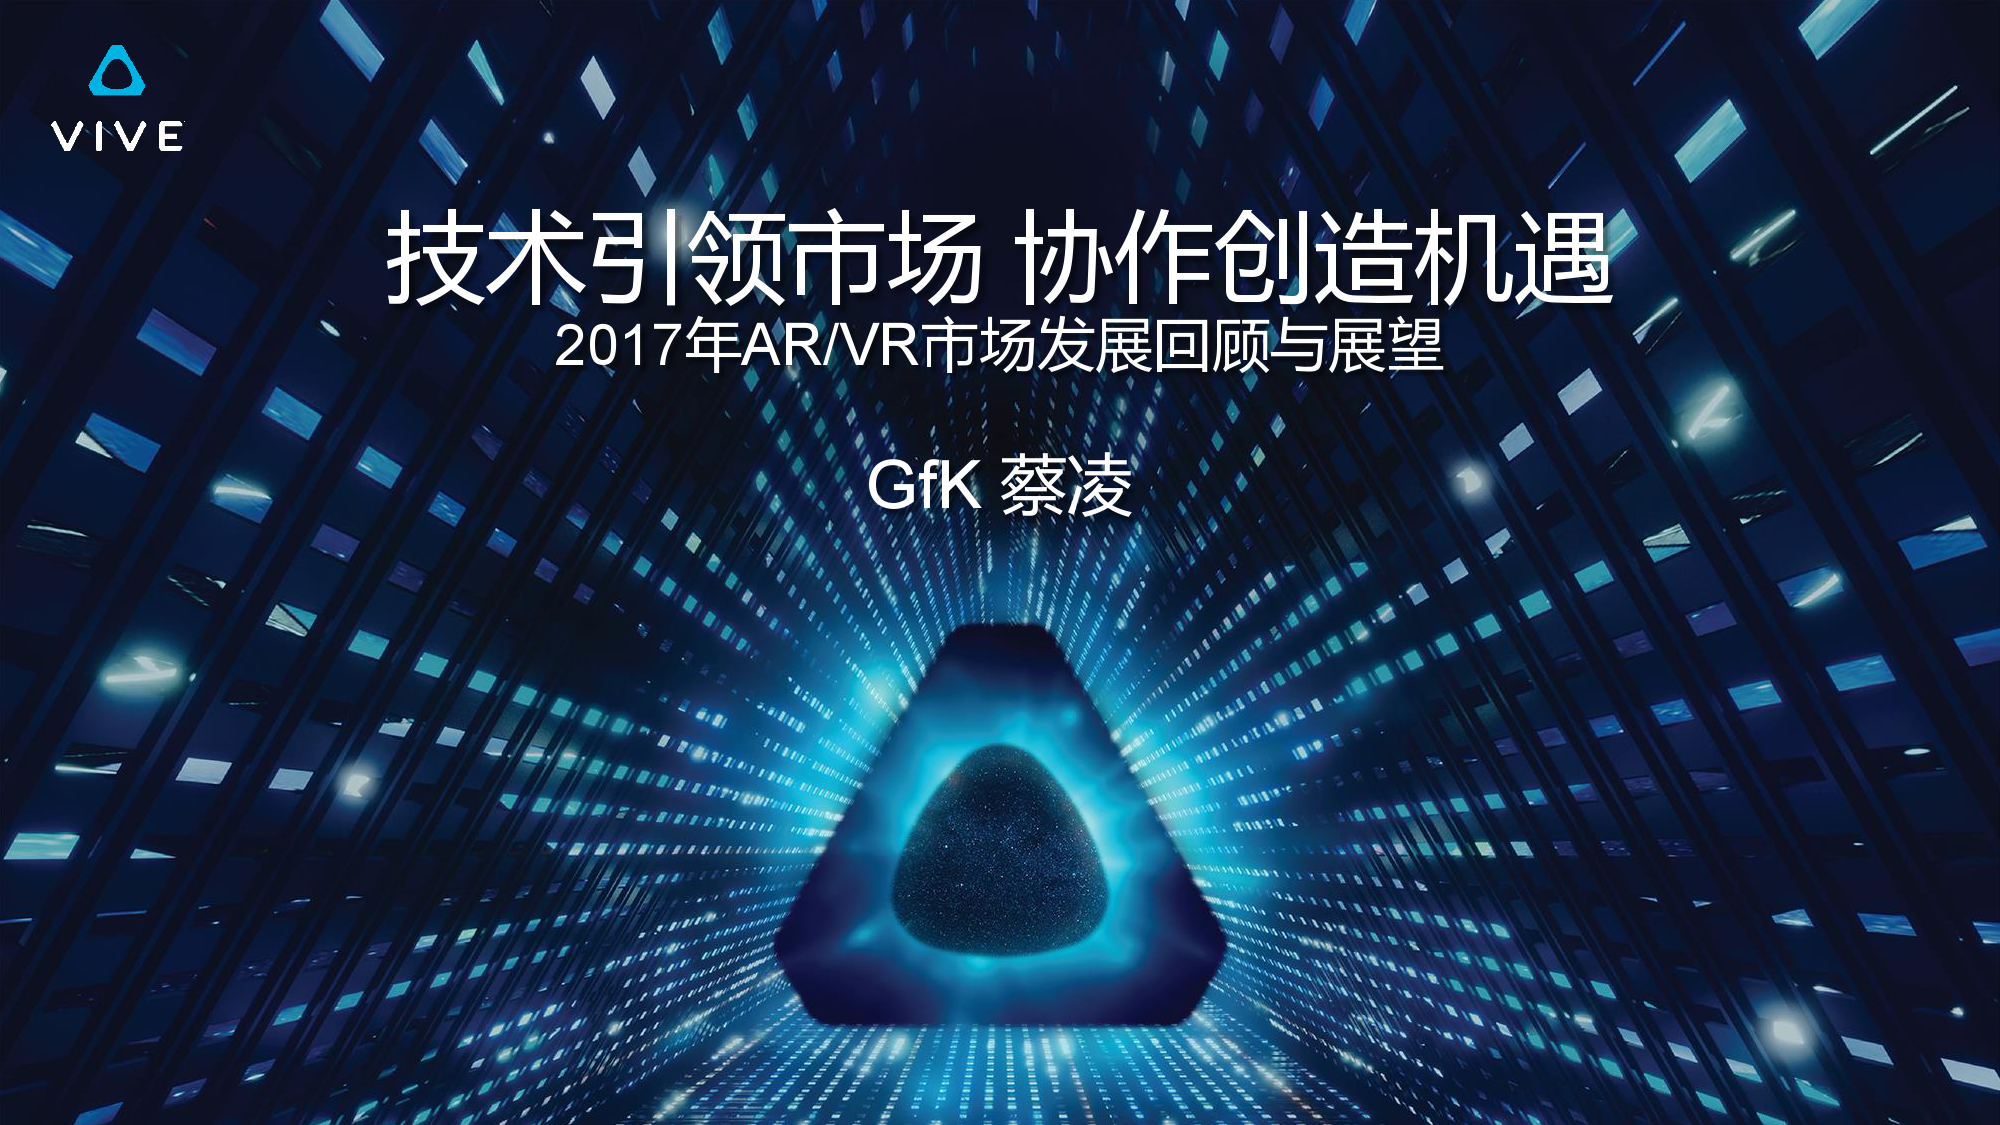 GFK:2017年AR/VR市场发展回顾与展望(附下载)